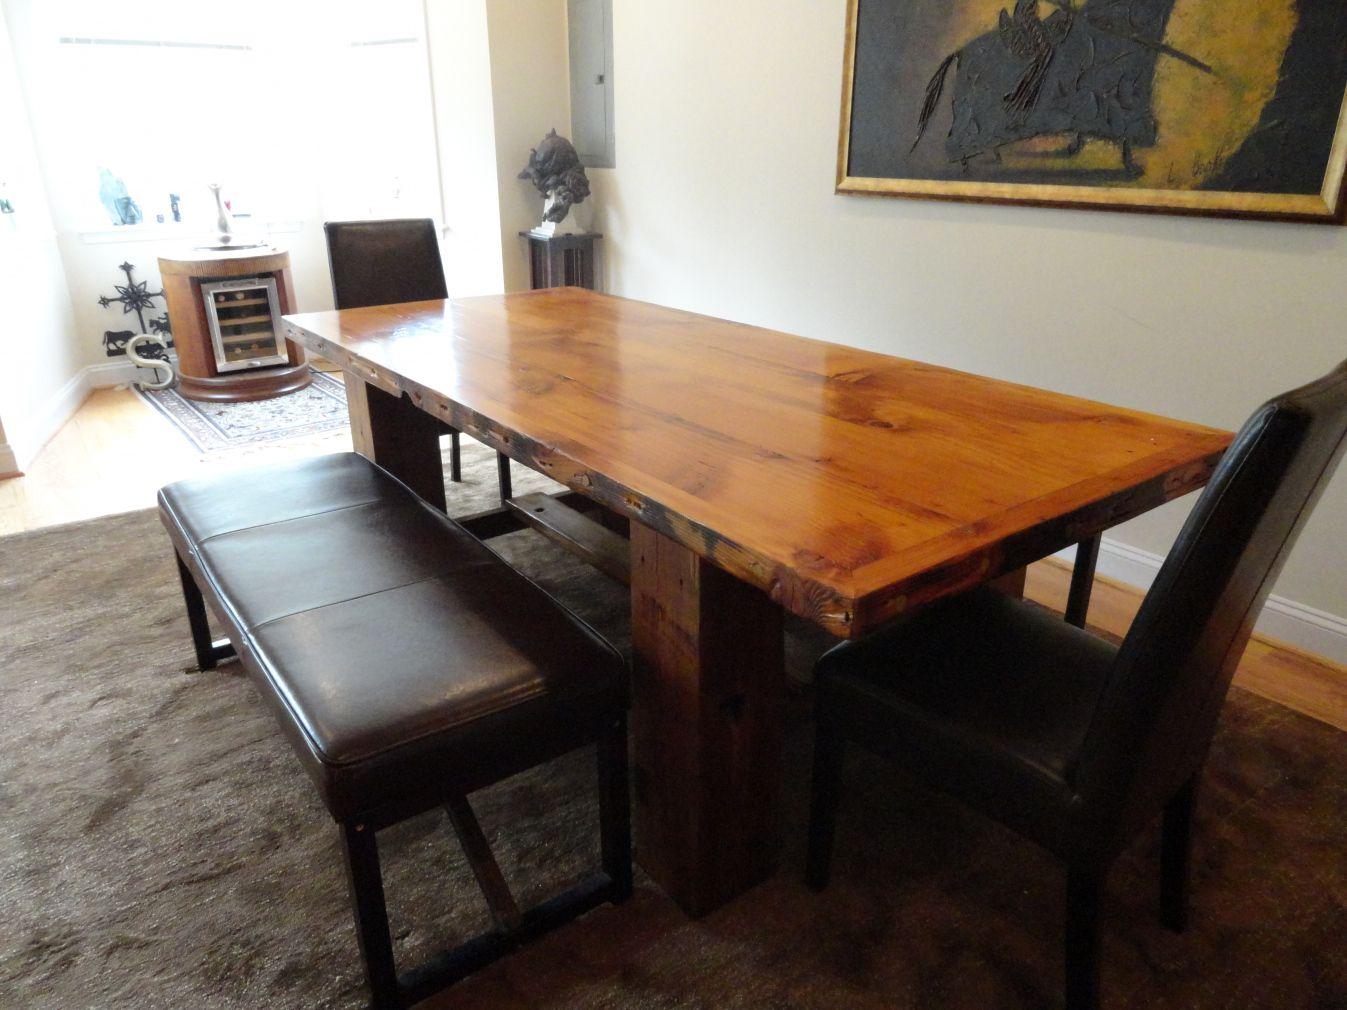 Kitchen Tables Denver  Contemporary Modern Furniture Check More Entrancing Contemporary Kitchen Tables Design Ideas